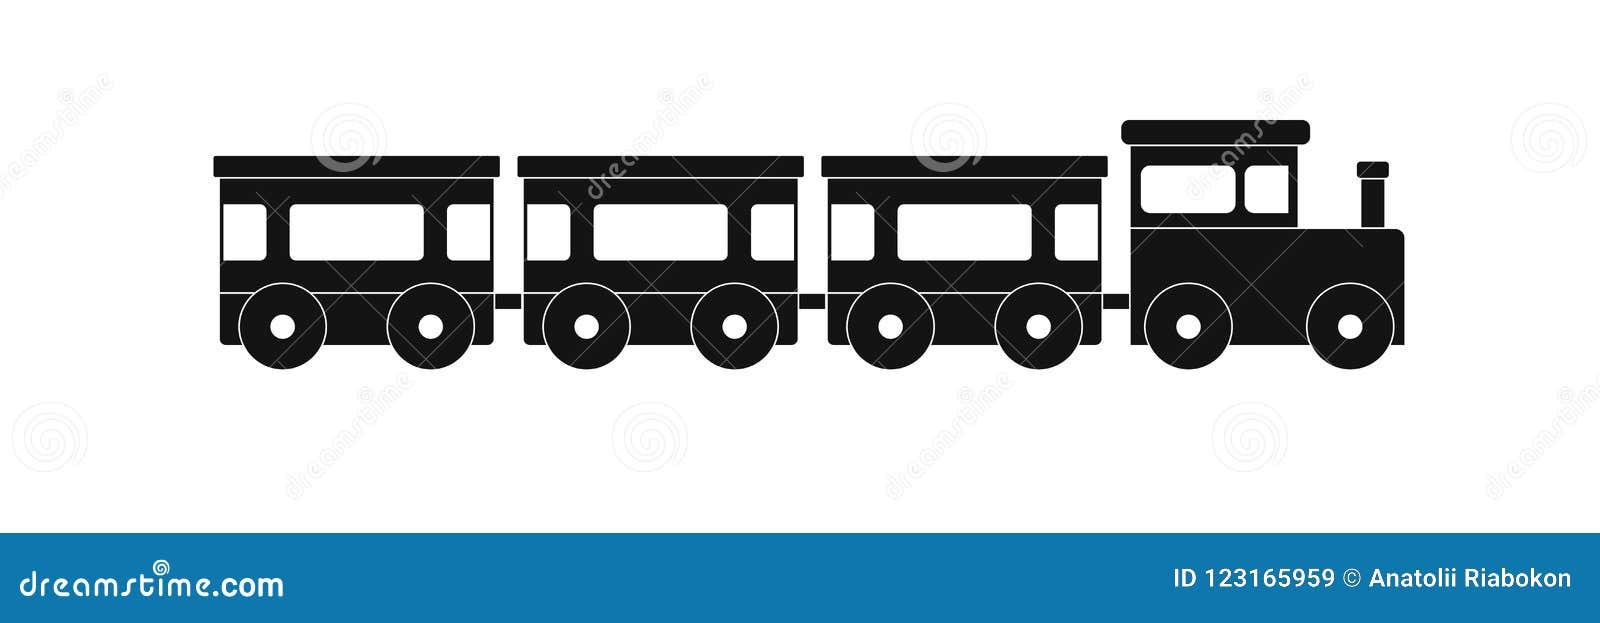 Express Train Icon Simple Style Stock Illustration Illustration